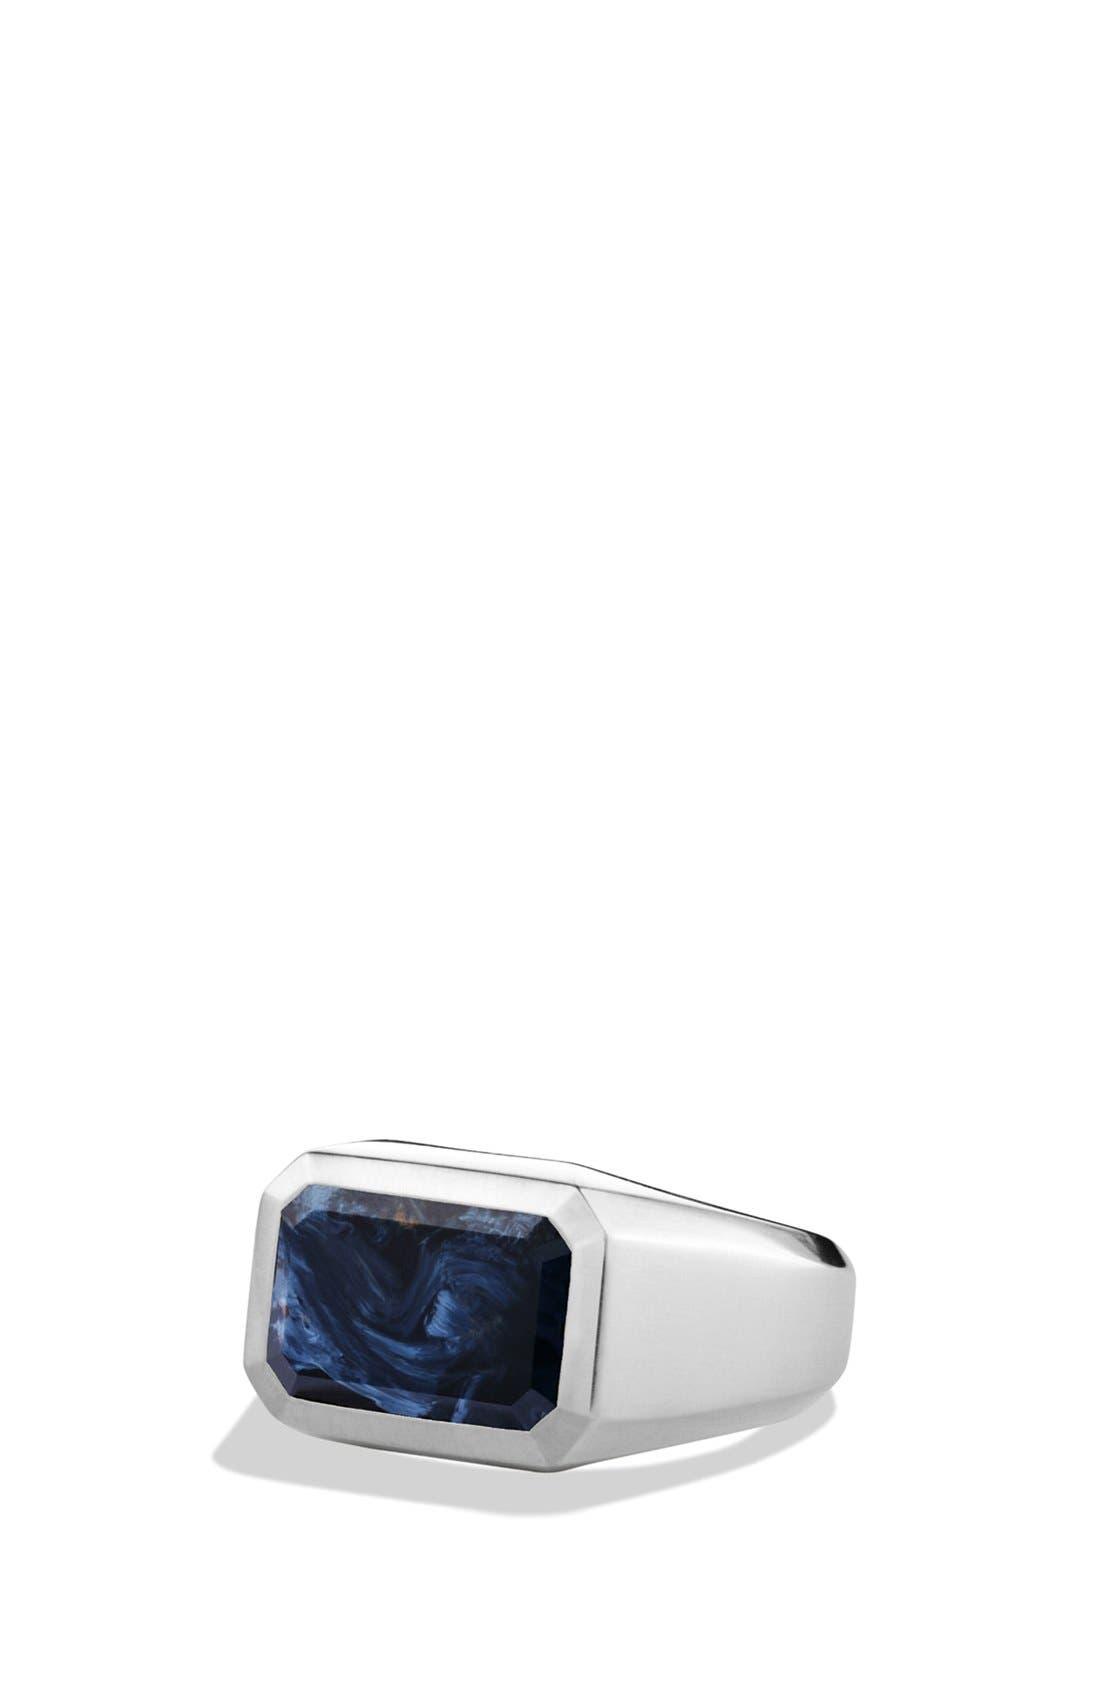 DAVID YURMAN Exotic Stone Signet Ring with Semiprecious Stone